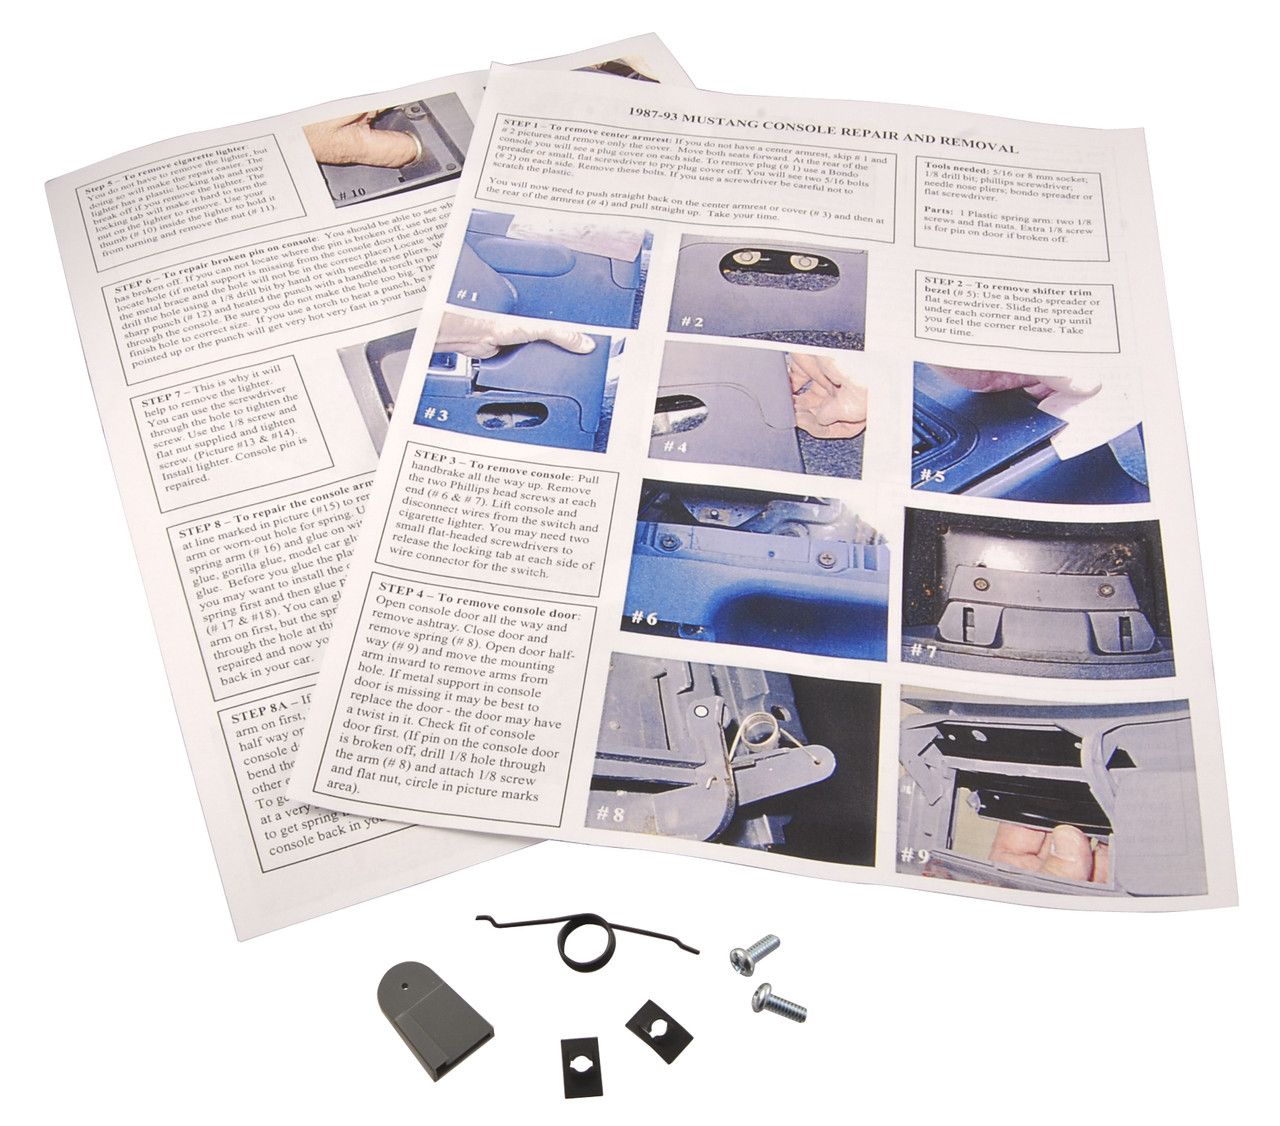 1987-1993 Ford Mustang ashtray lid repair kit.